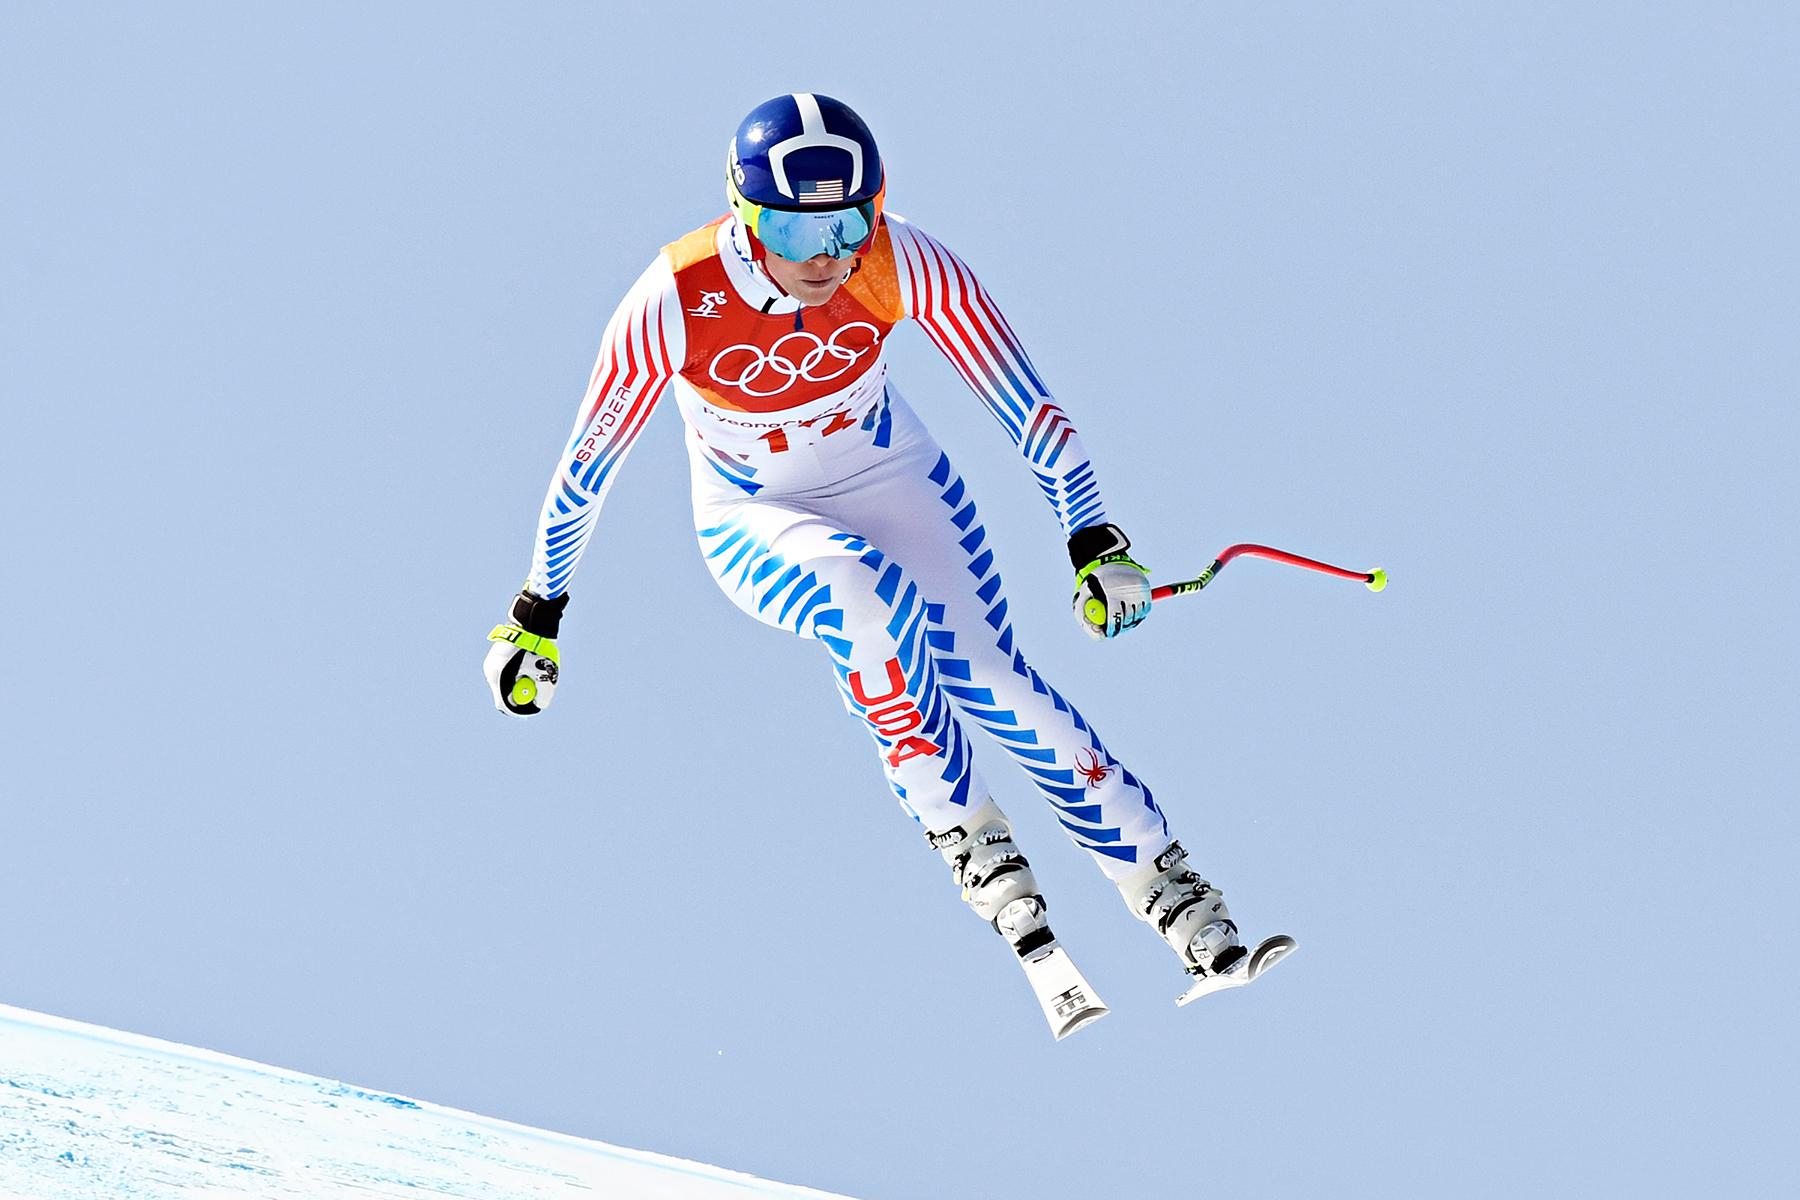 Lindsey Vonn PyeongChang 2018 Winter Olympics